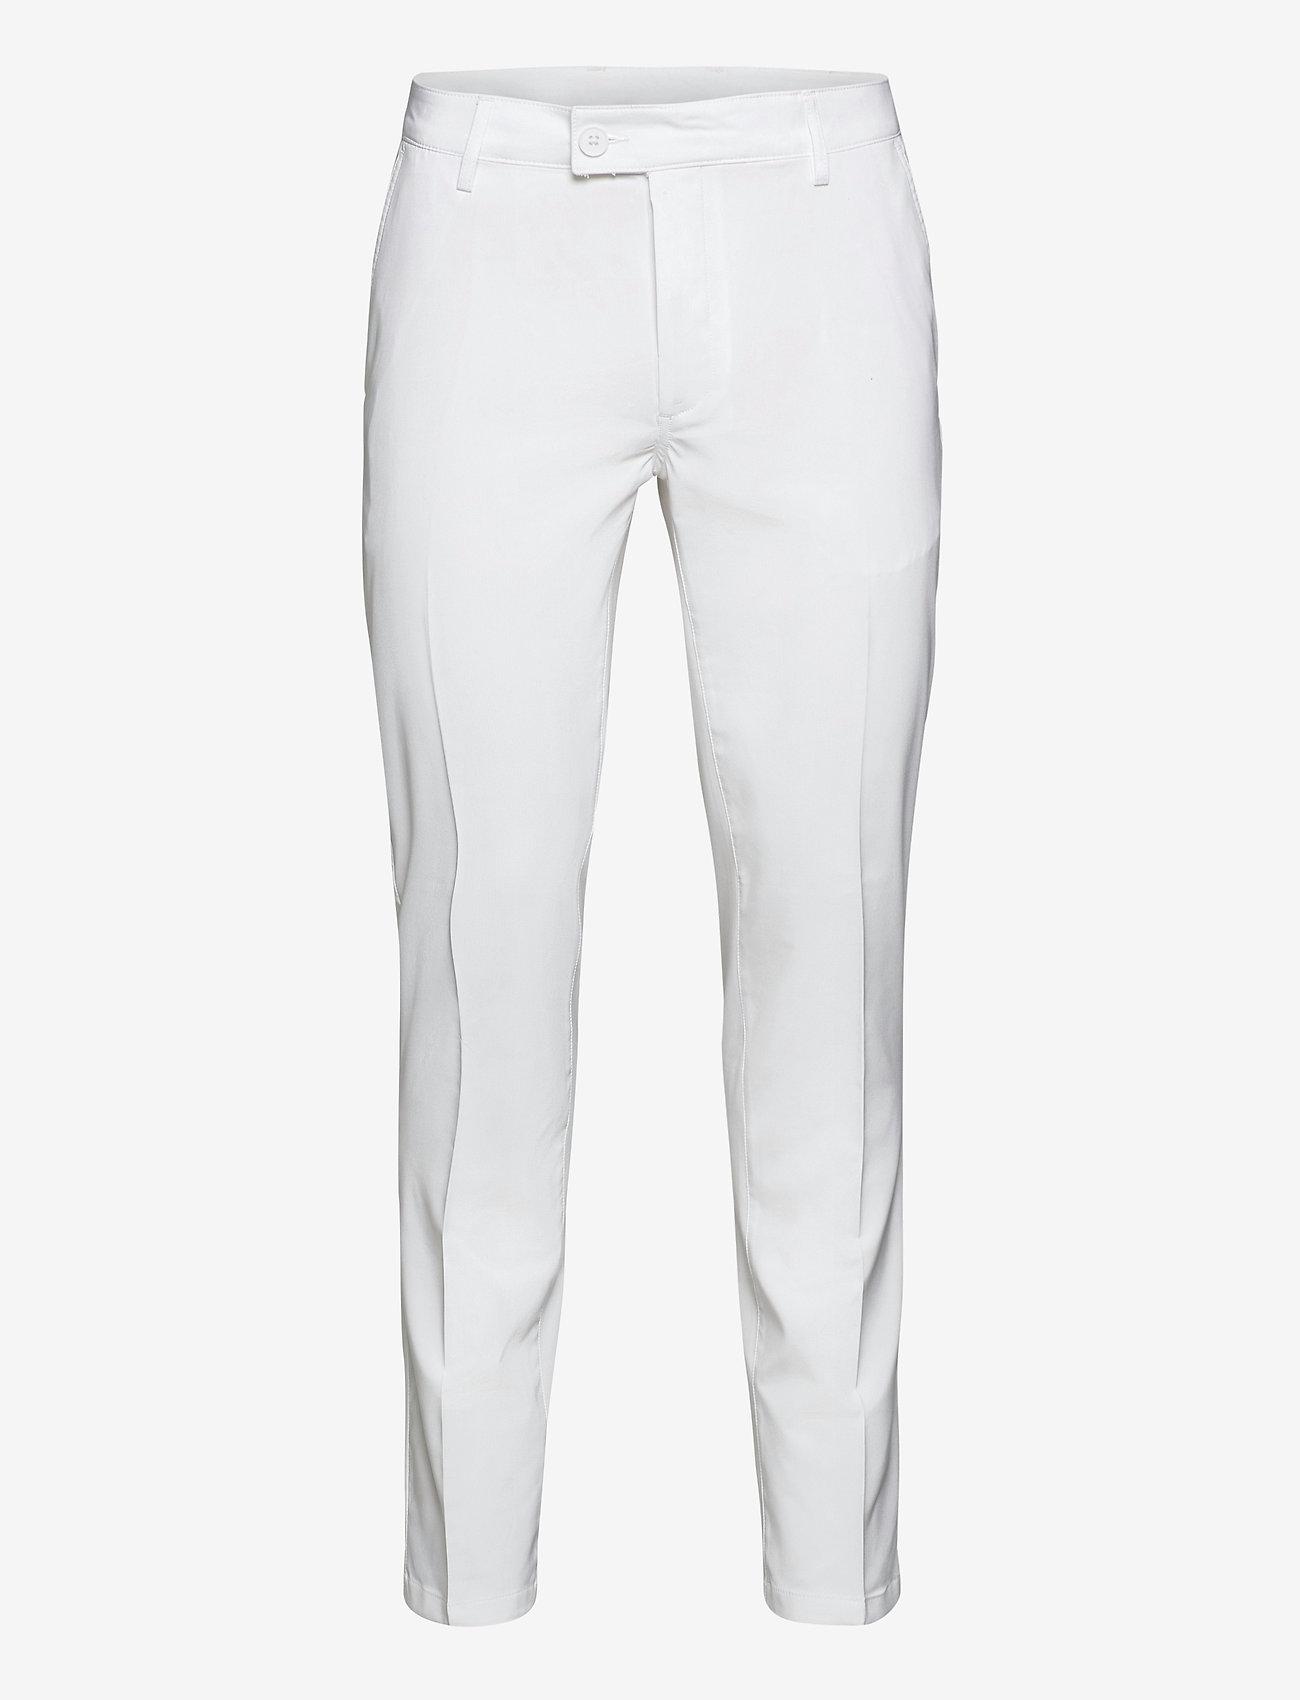 Abacus - Mens Cleek stretch trousers - golf-housut - white - 0